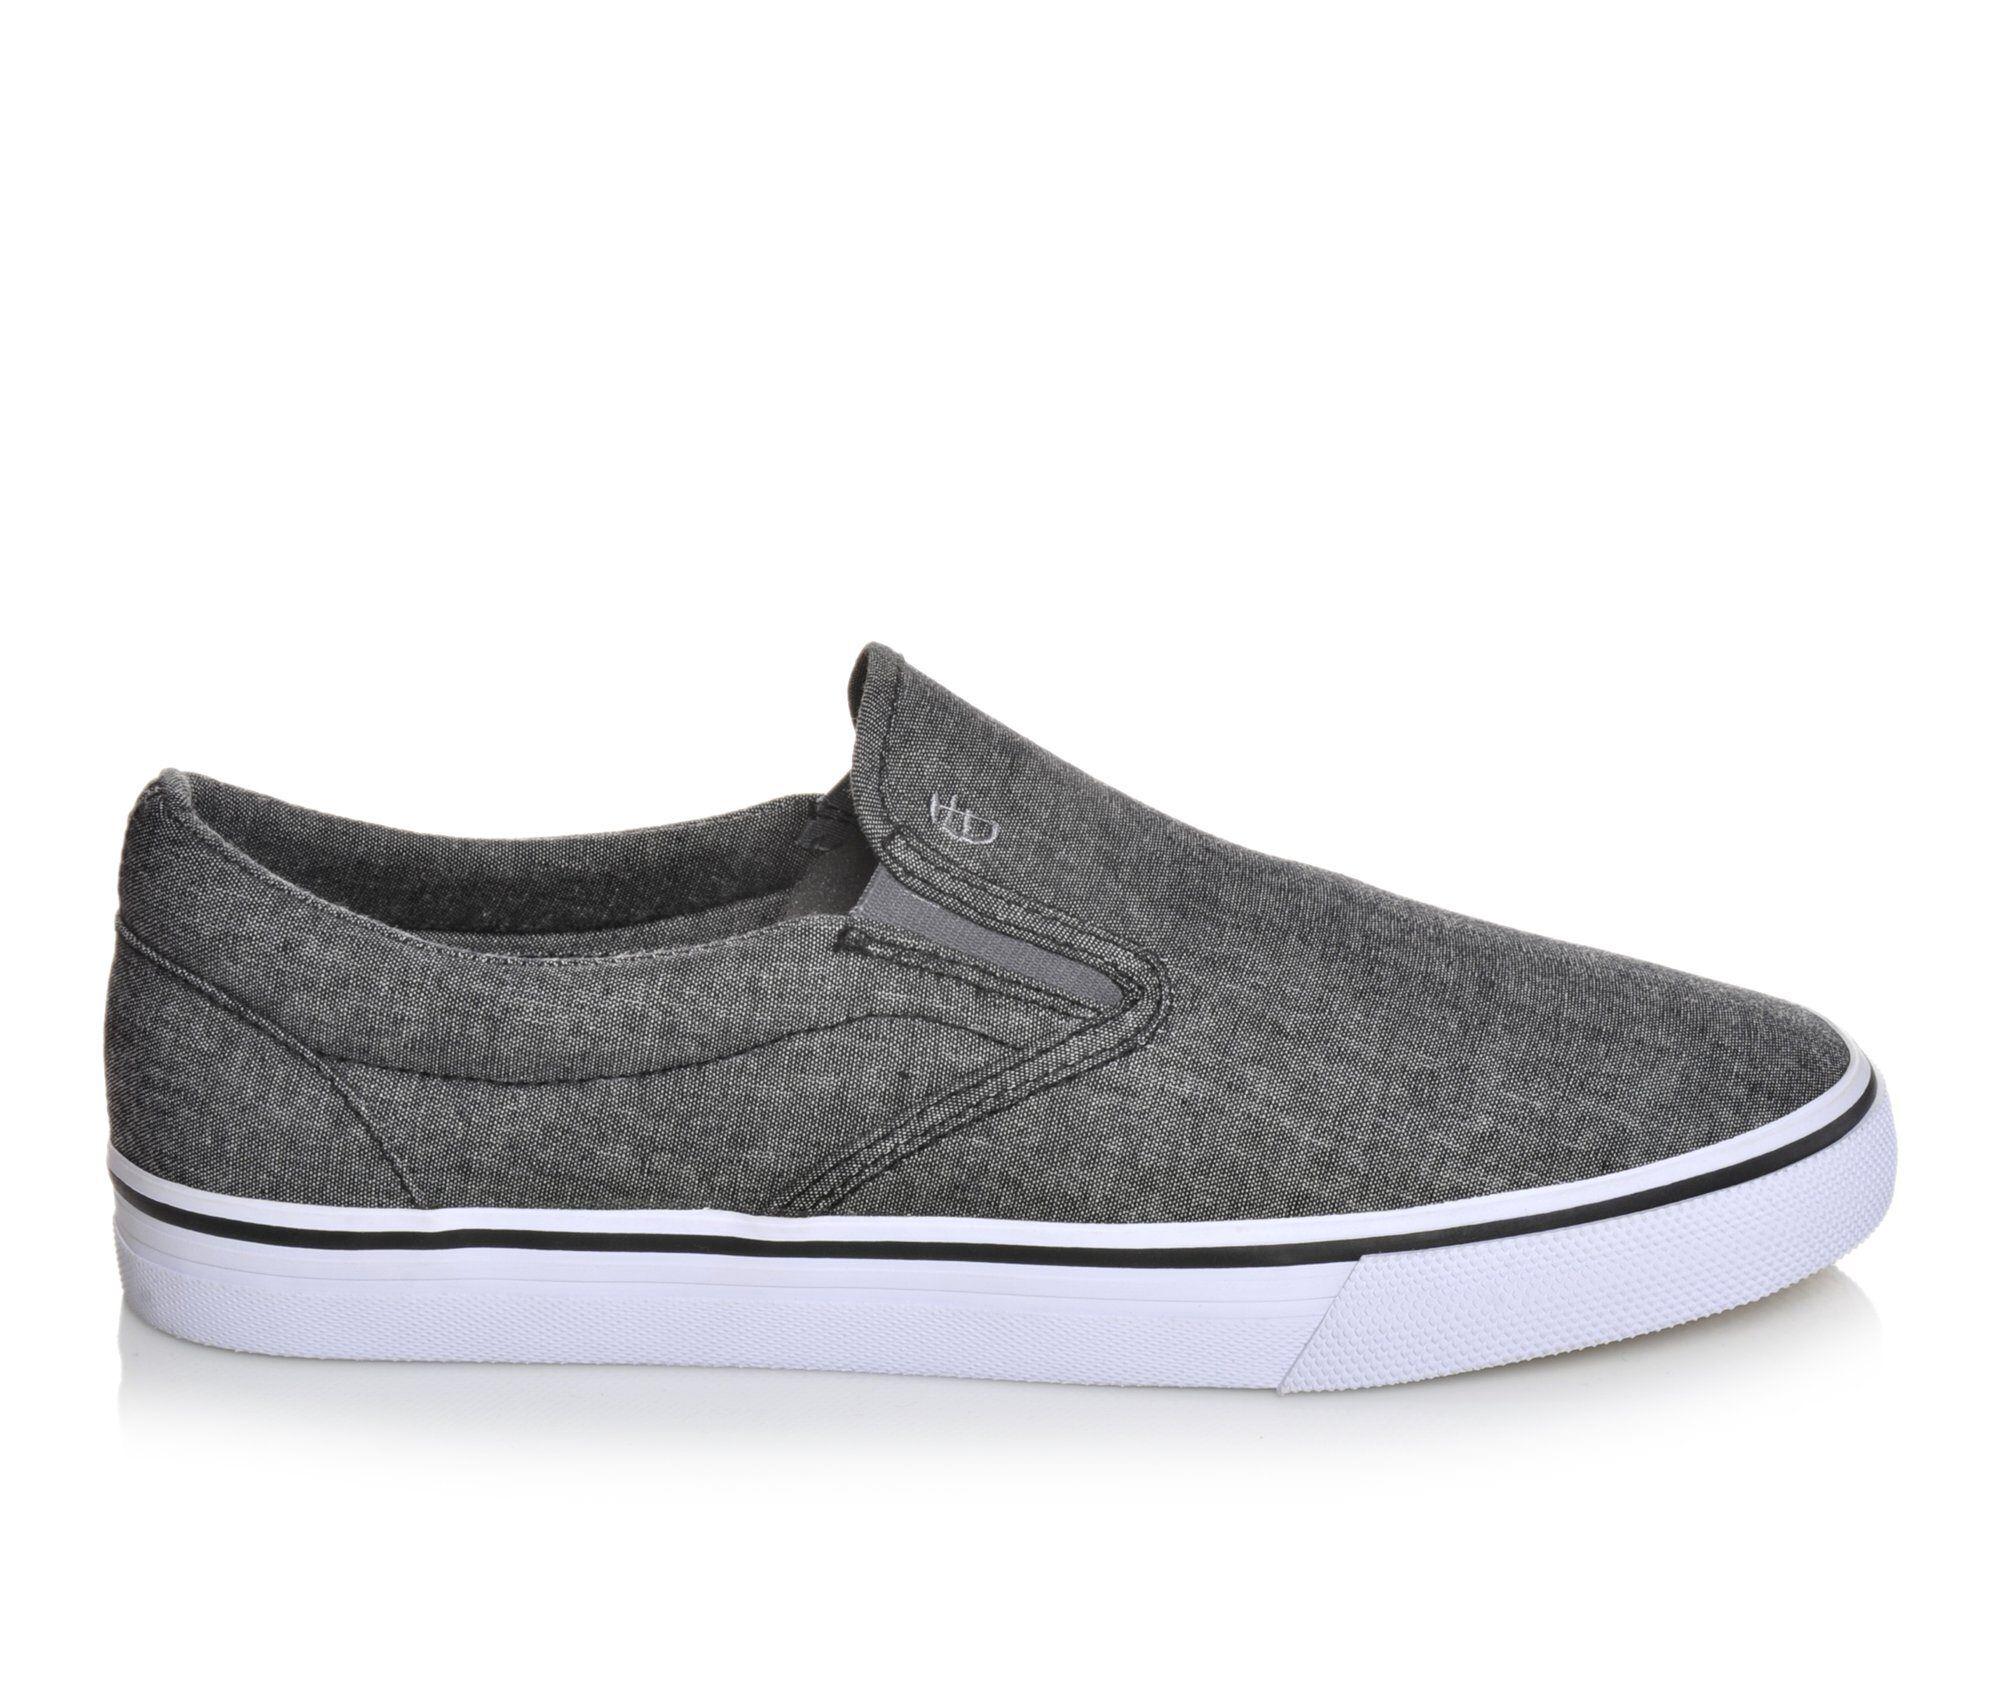 Men's Crevo Boone Dock Casual Shoes newest sast online jxRHXxQ9mH